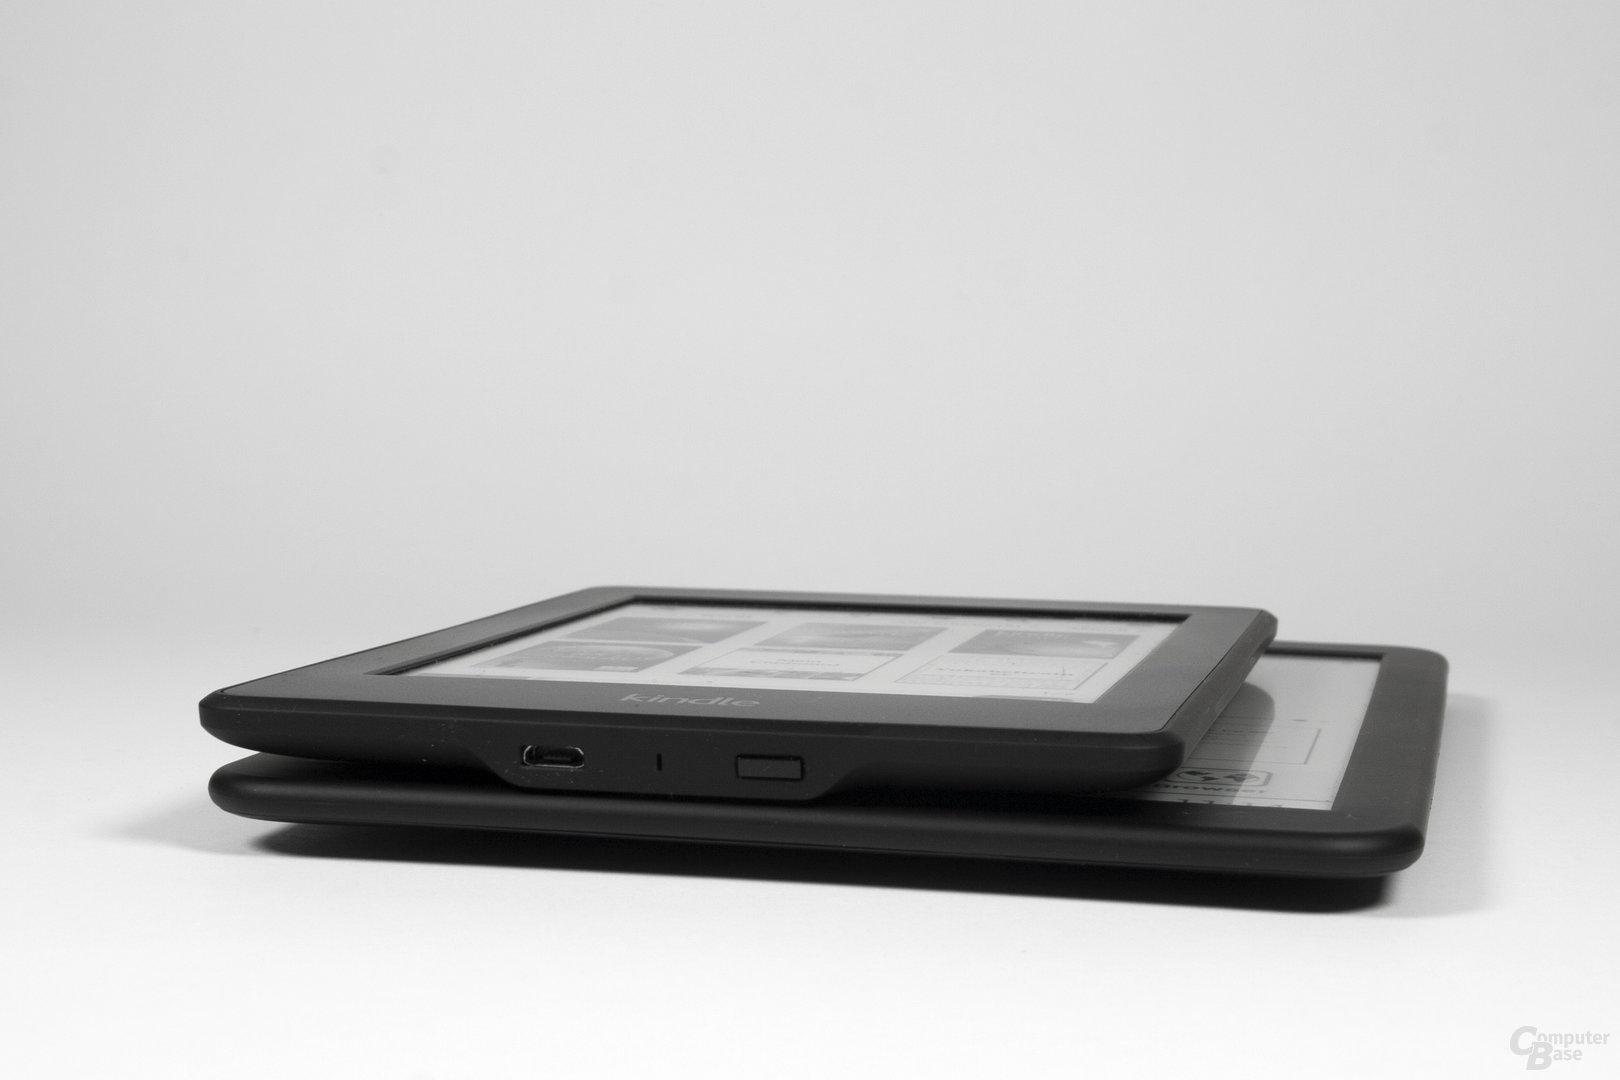 Größenvergleich Kindle Paperwhite vs. Icarus Illumina XL